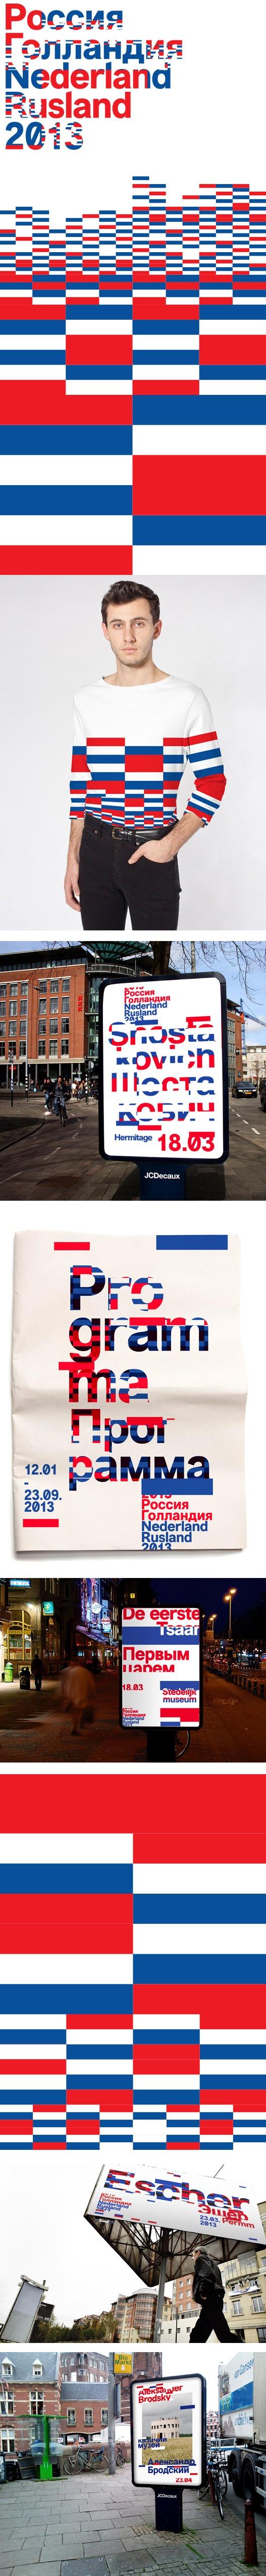 Nederland-Ruslandjaar 2013 | Lava Graphic Design, Amsterdam